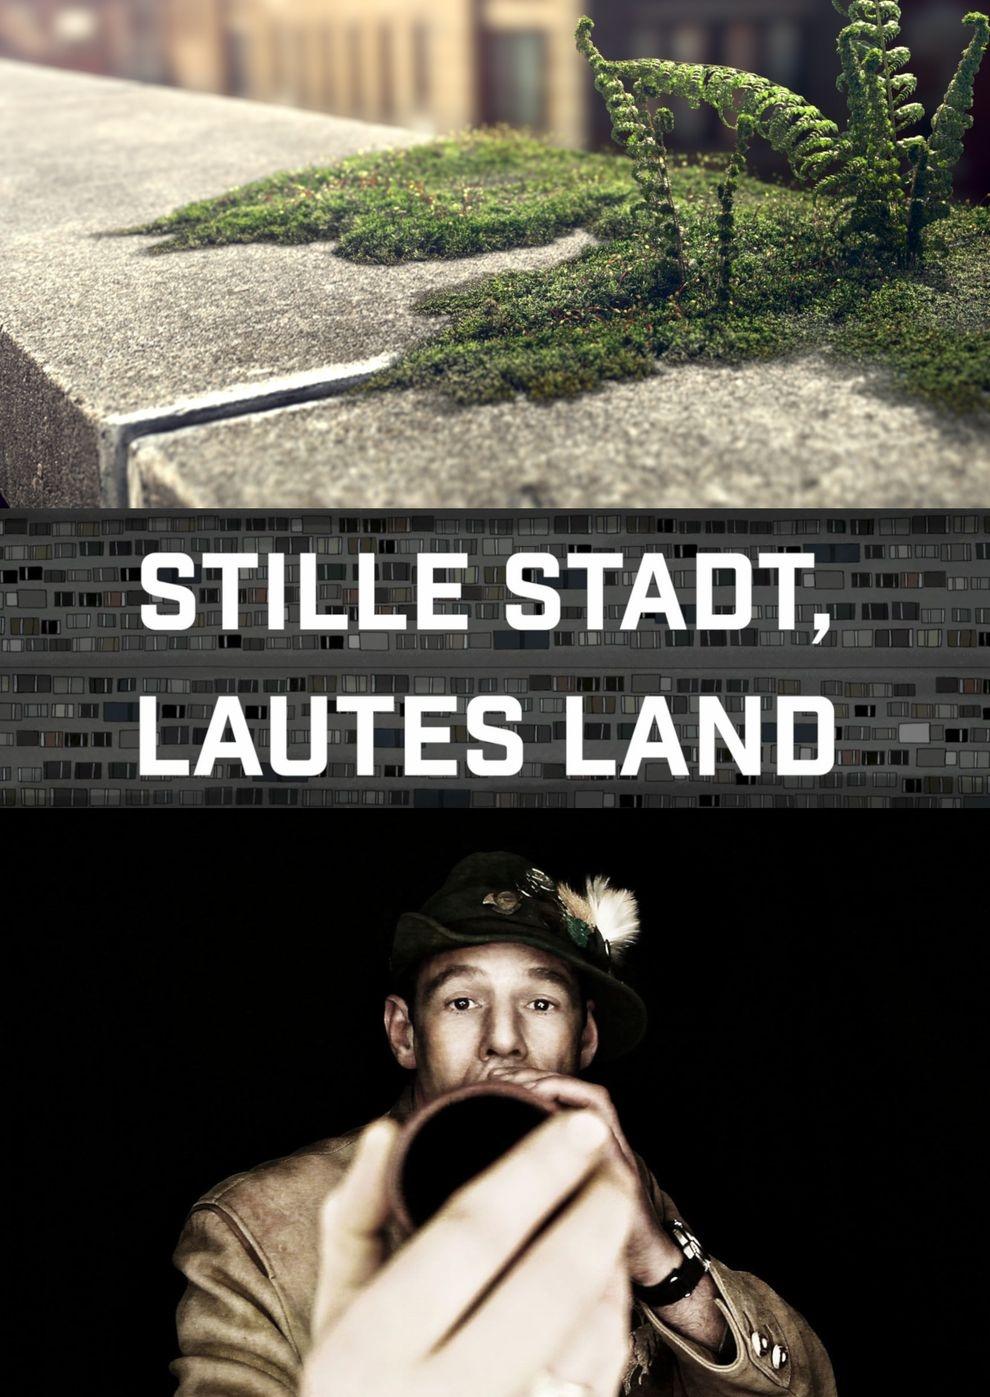 Stille Stadt, lautes Land (Poster)